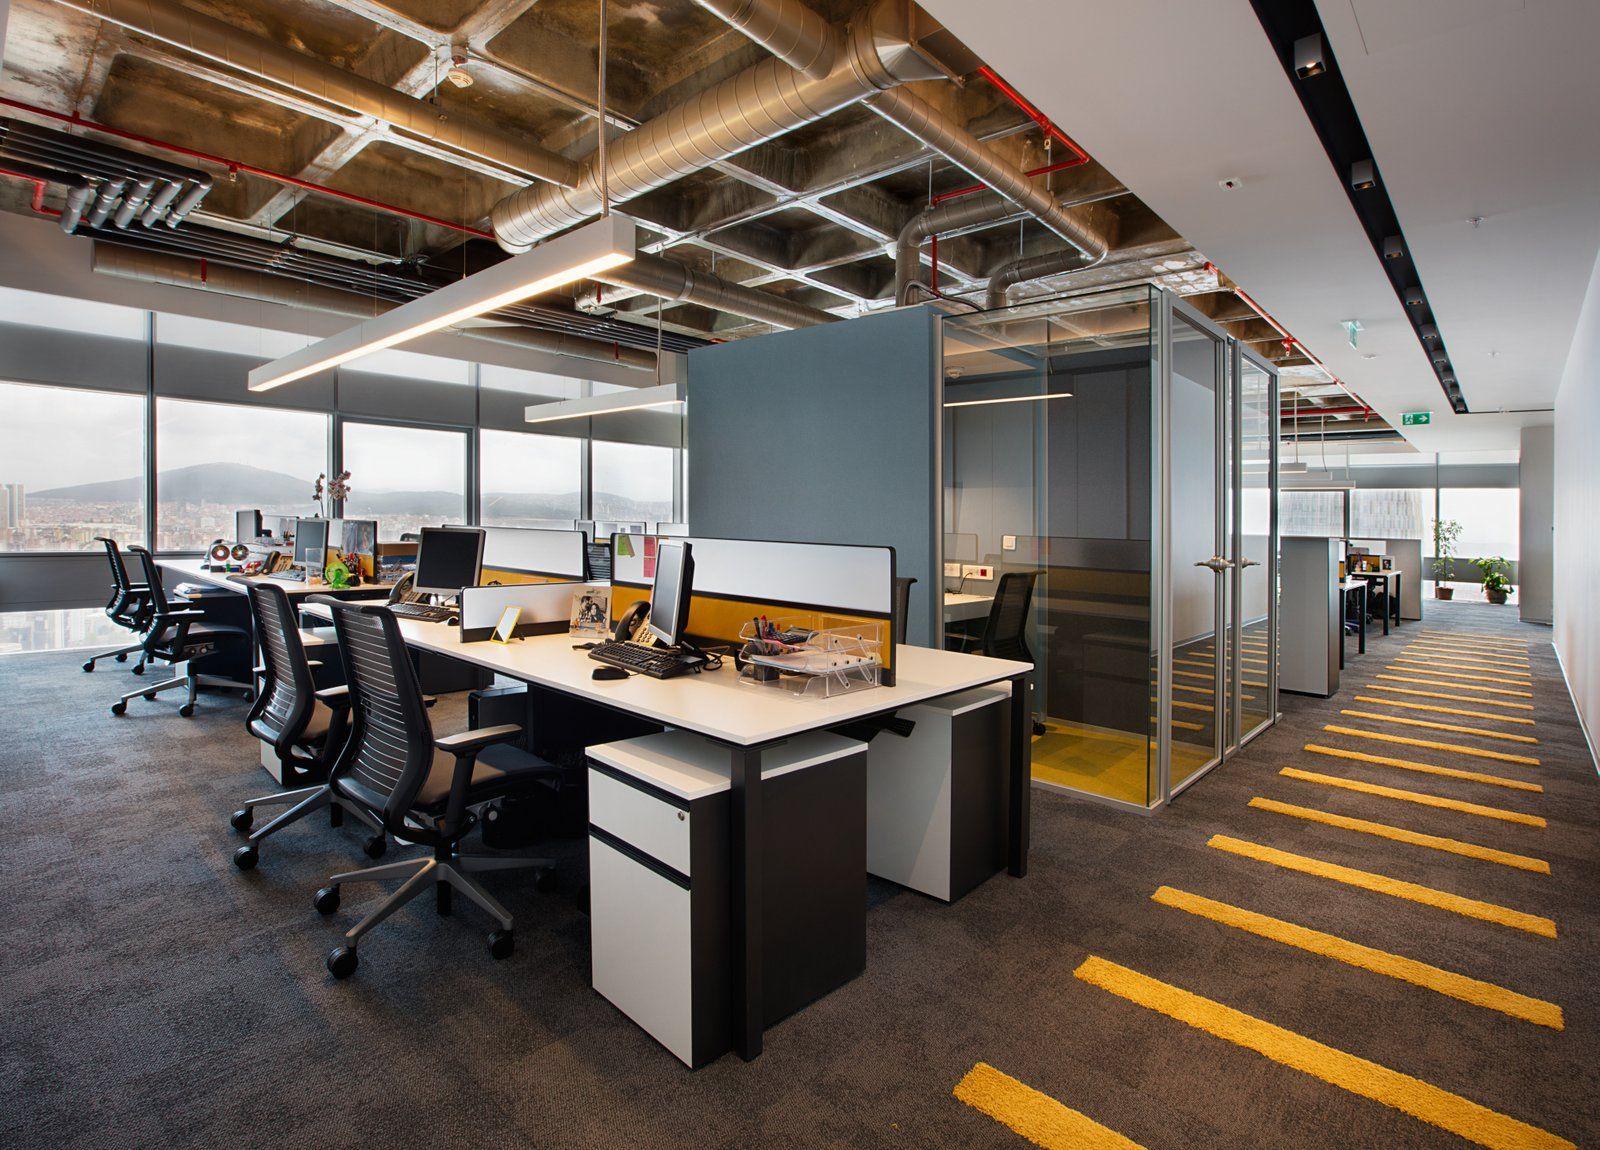 Cgf38 8097b Office Snapshots Open Office Design Office Interior Design Modern Office Design